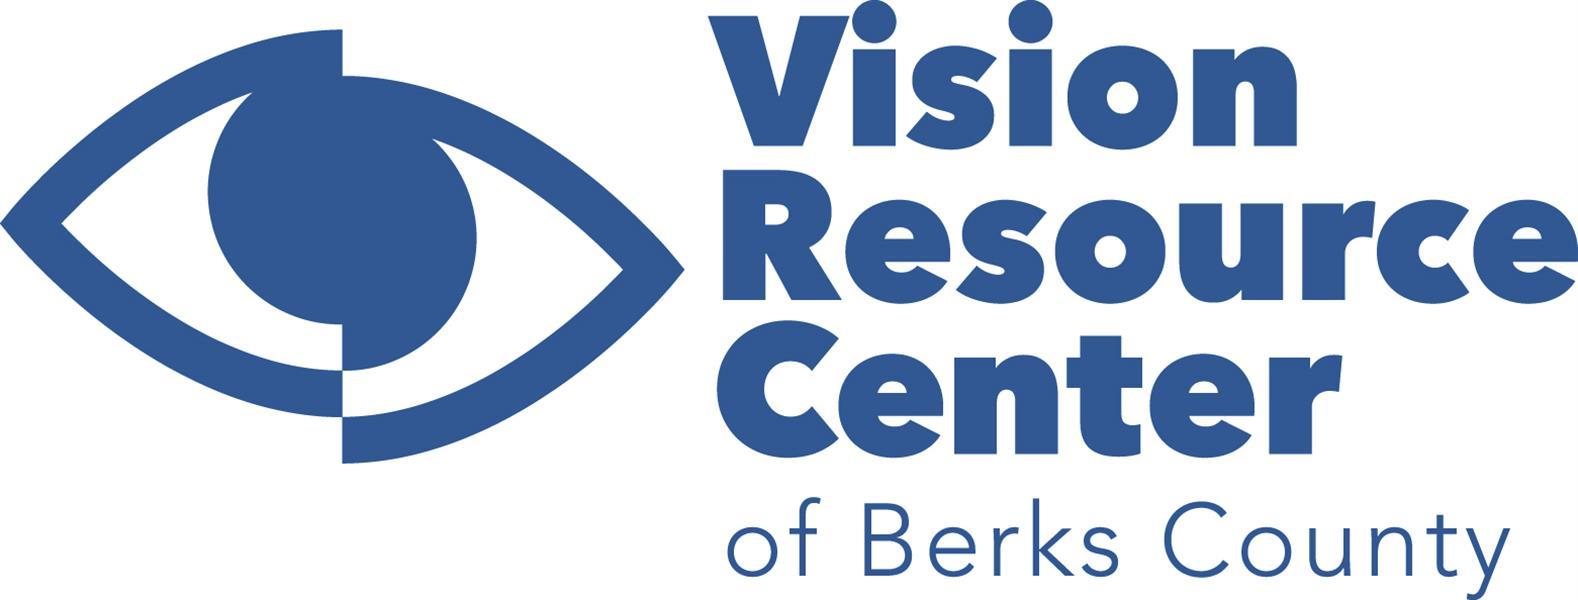 Vision Resource Center of Berks County Logo